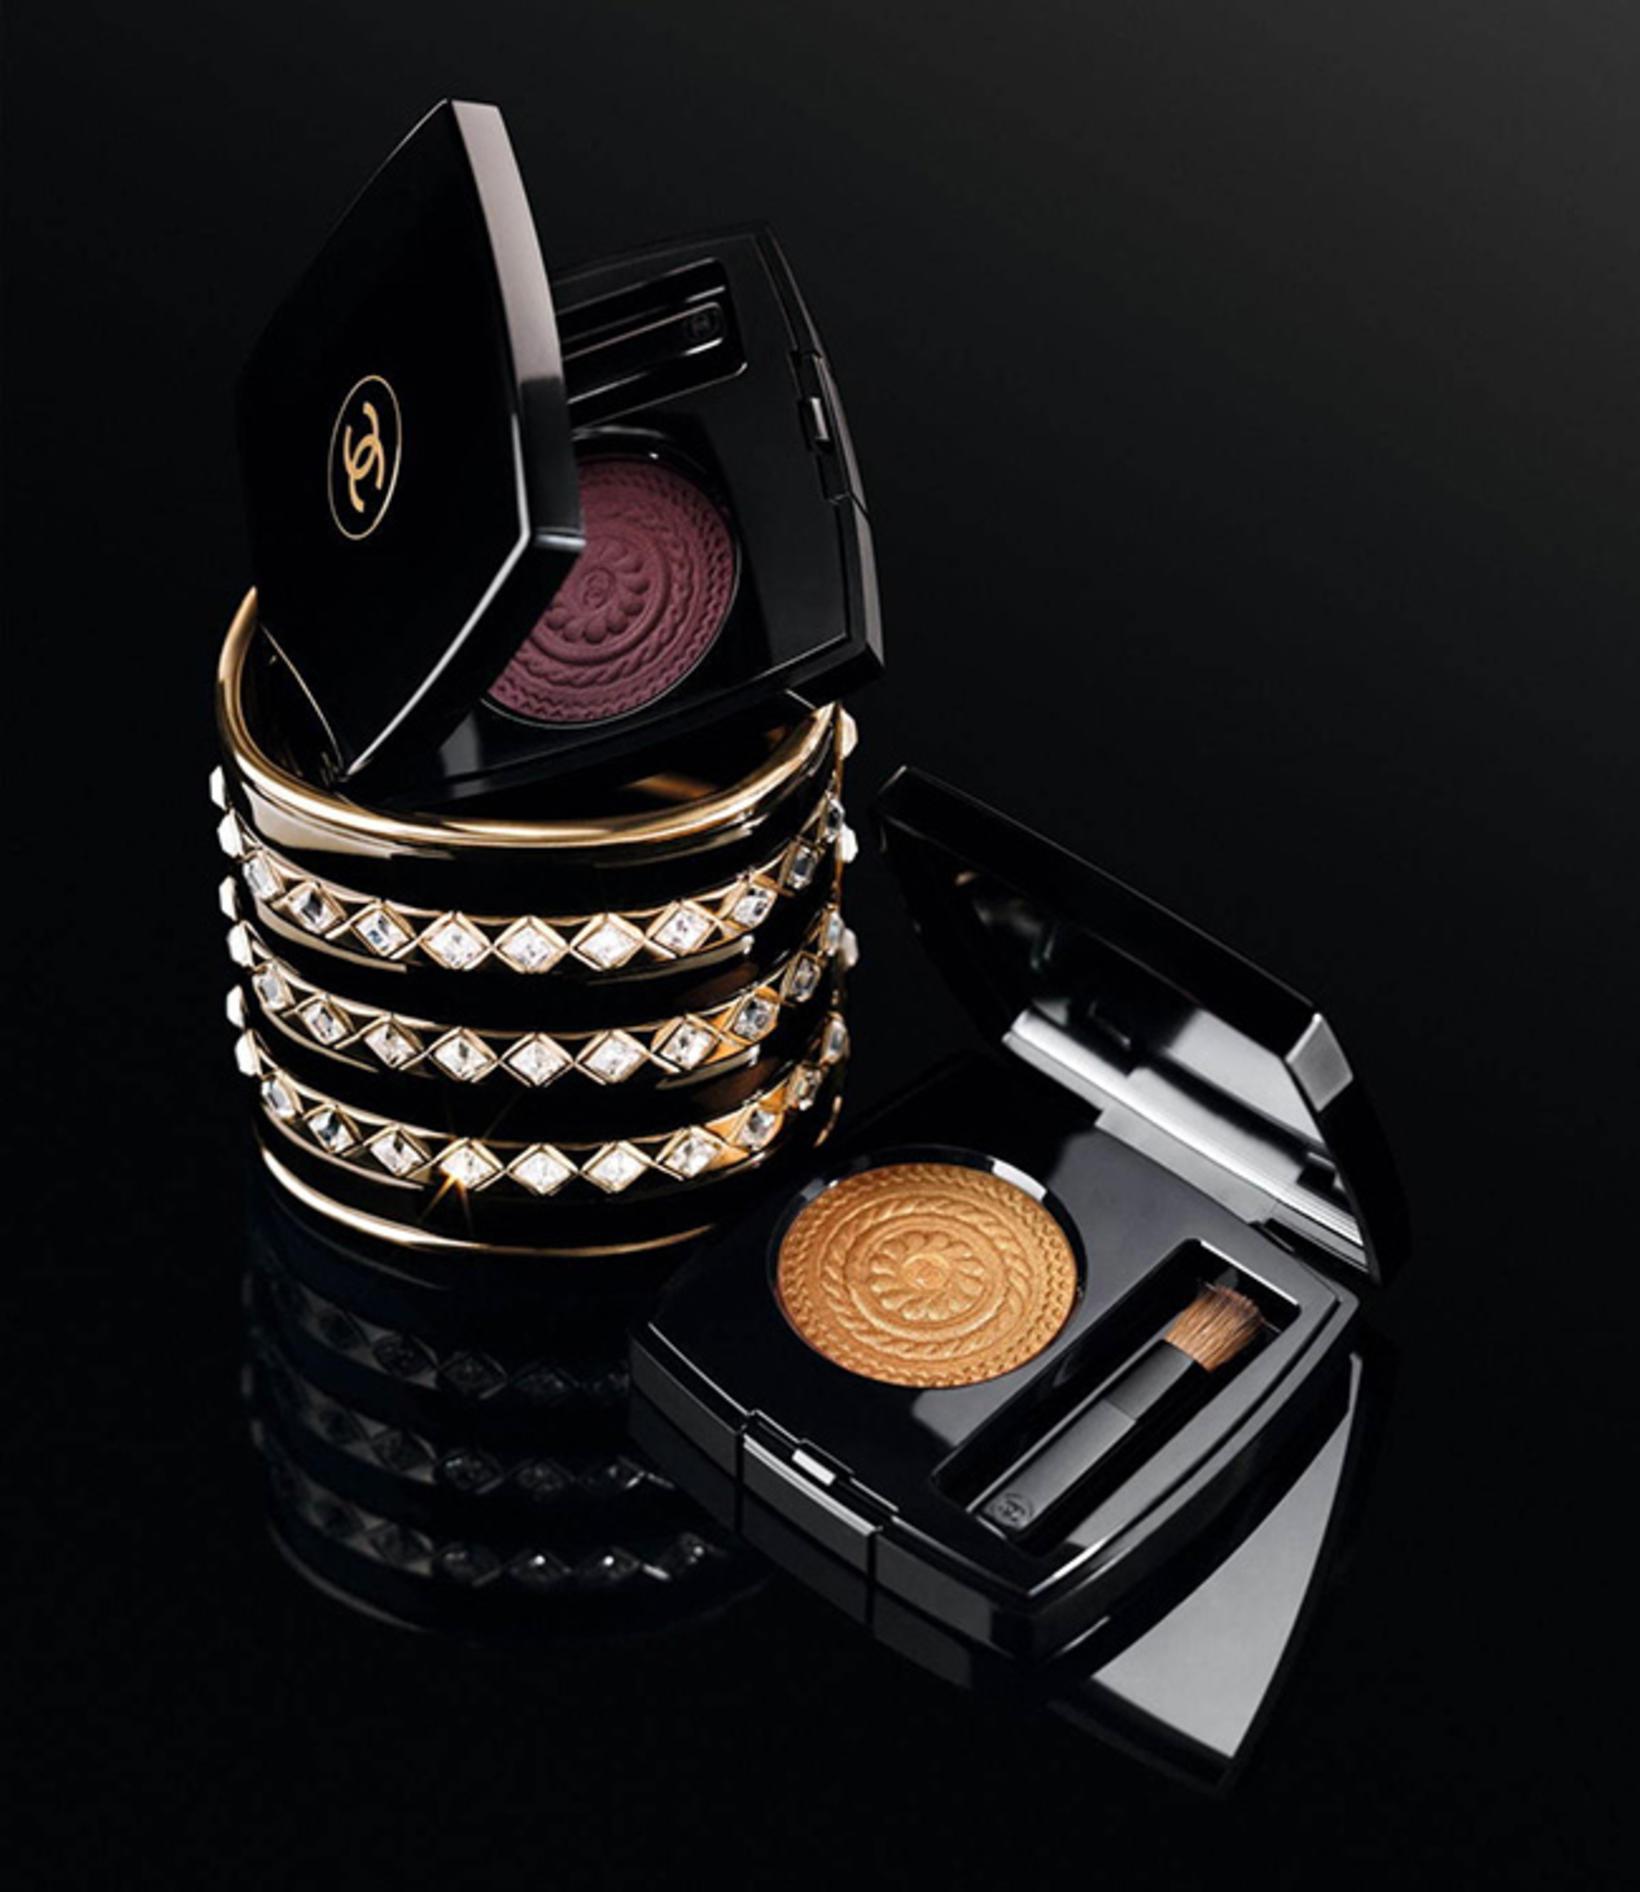 Chanel Ombre Premiére koma í tveimur litum.